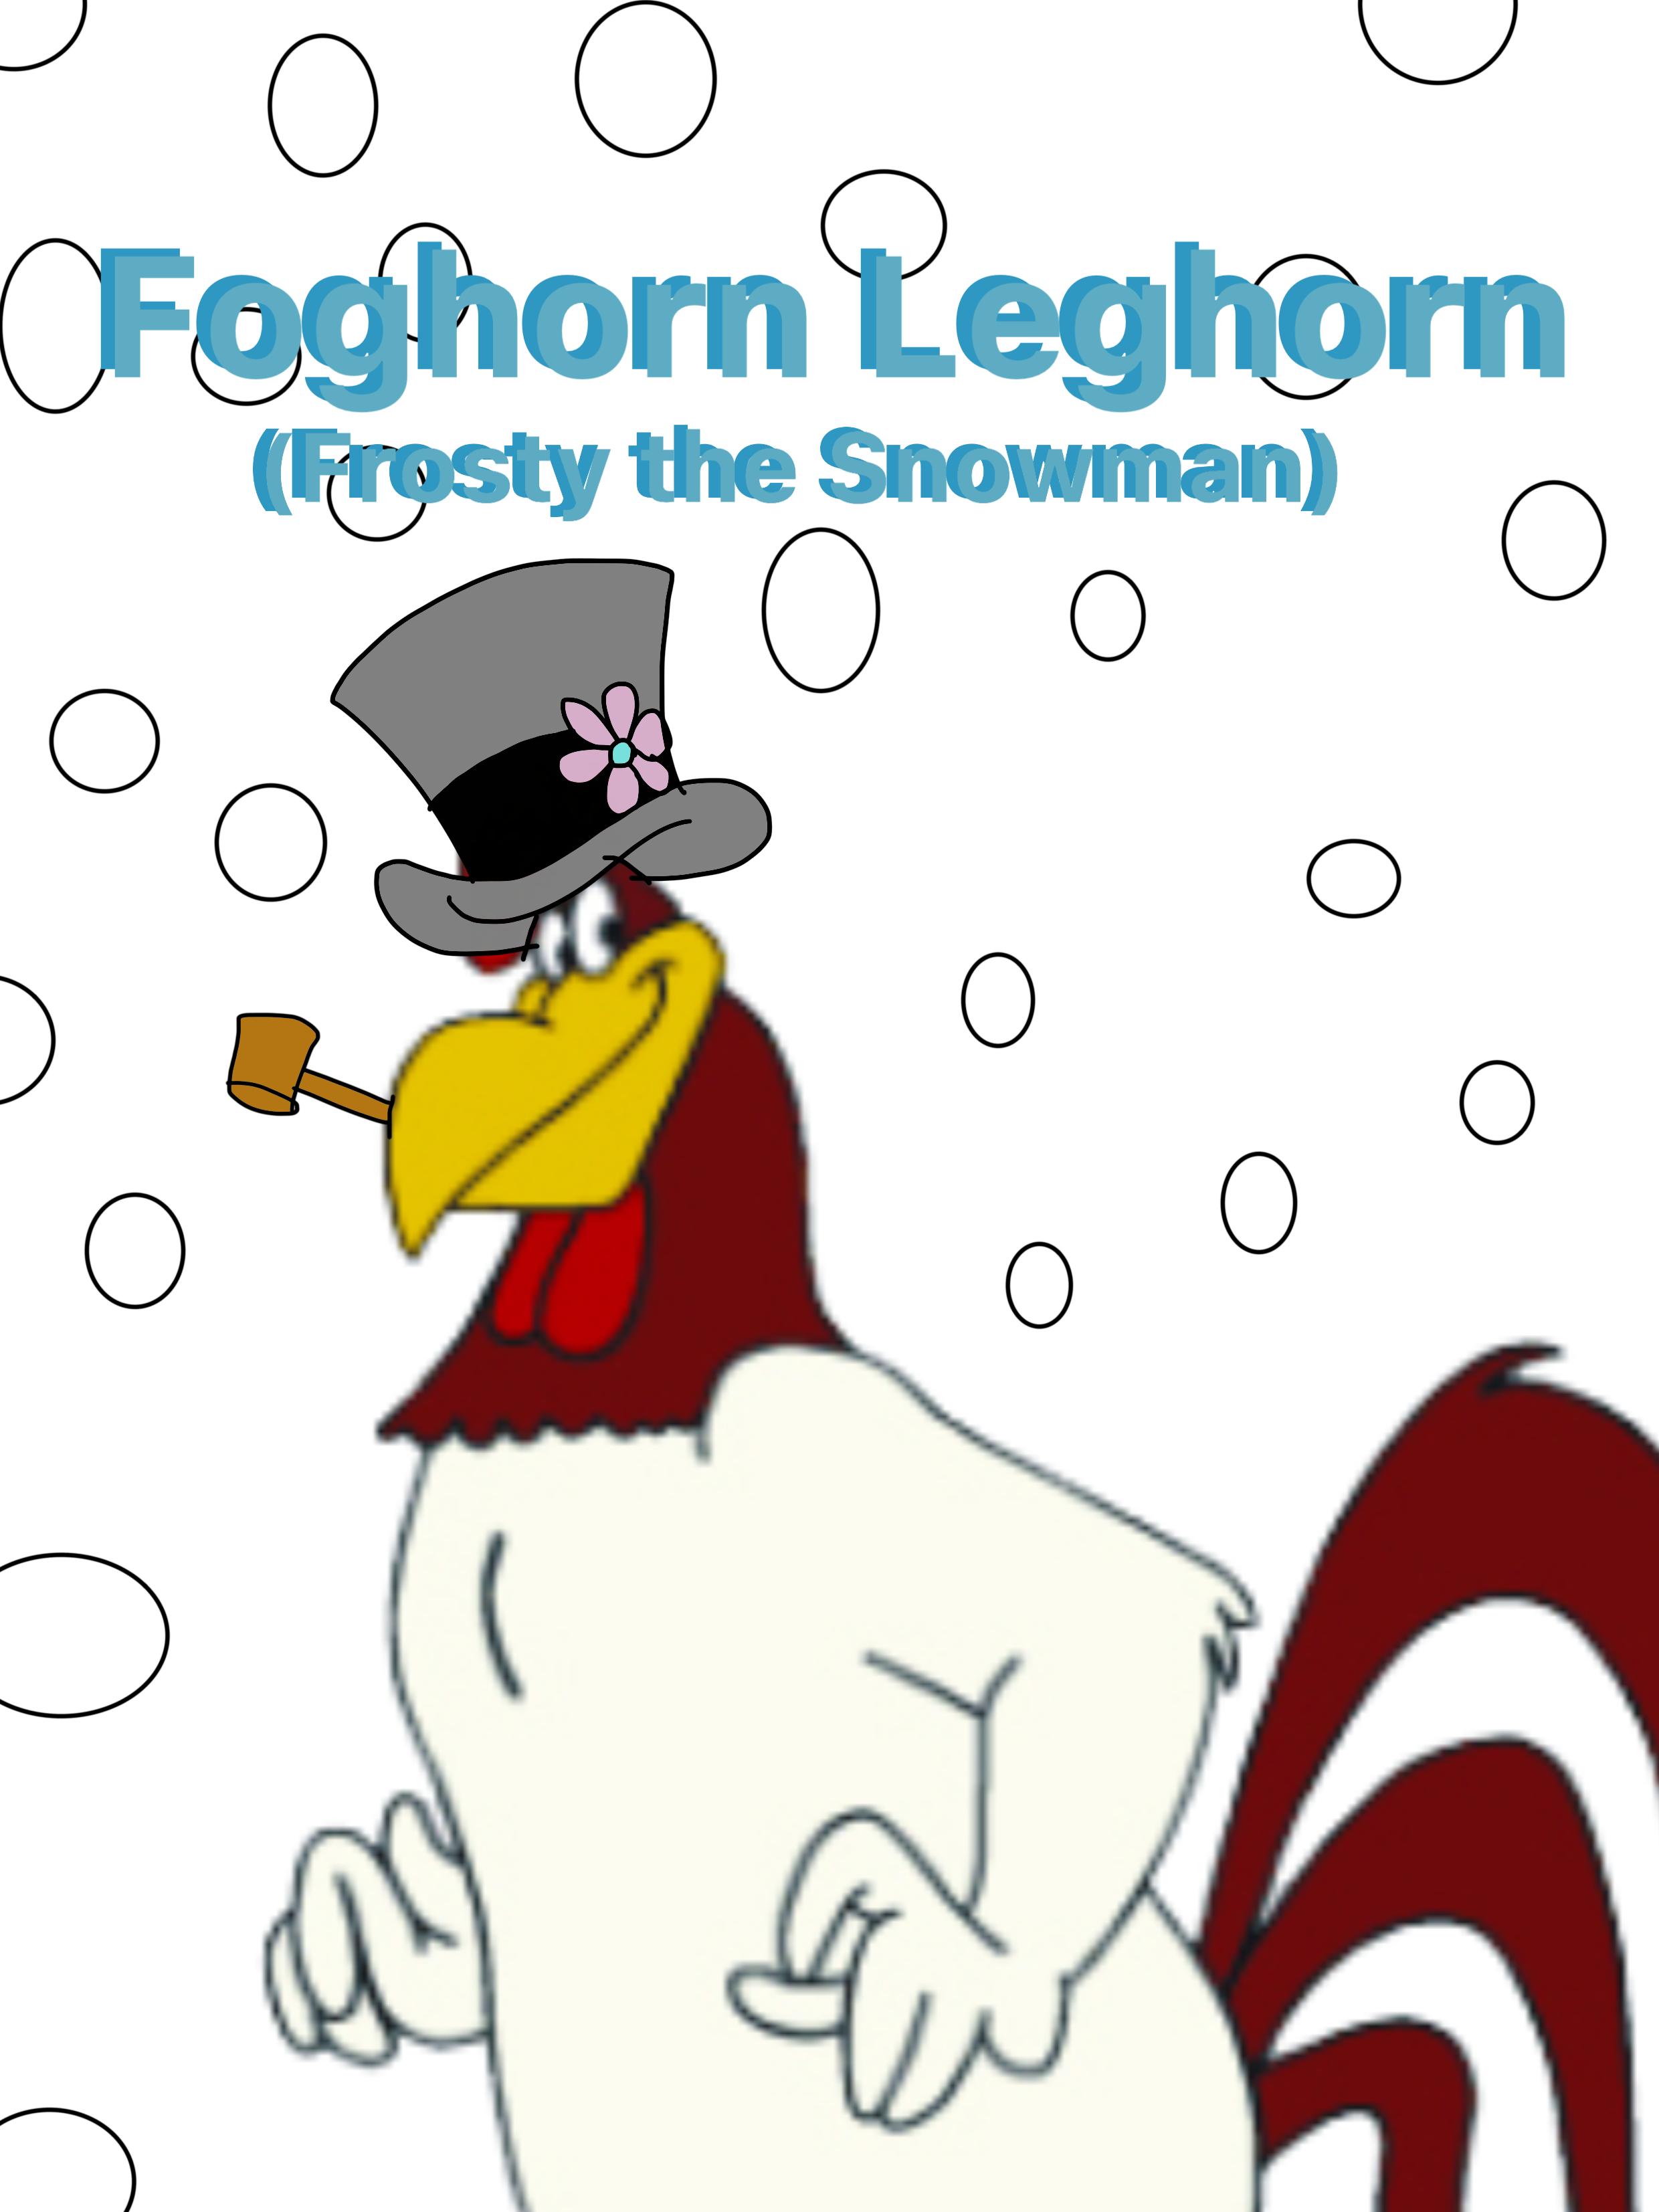 Foghorn Leghorn (Frosty the Snowman)